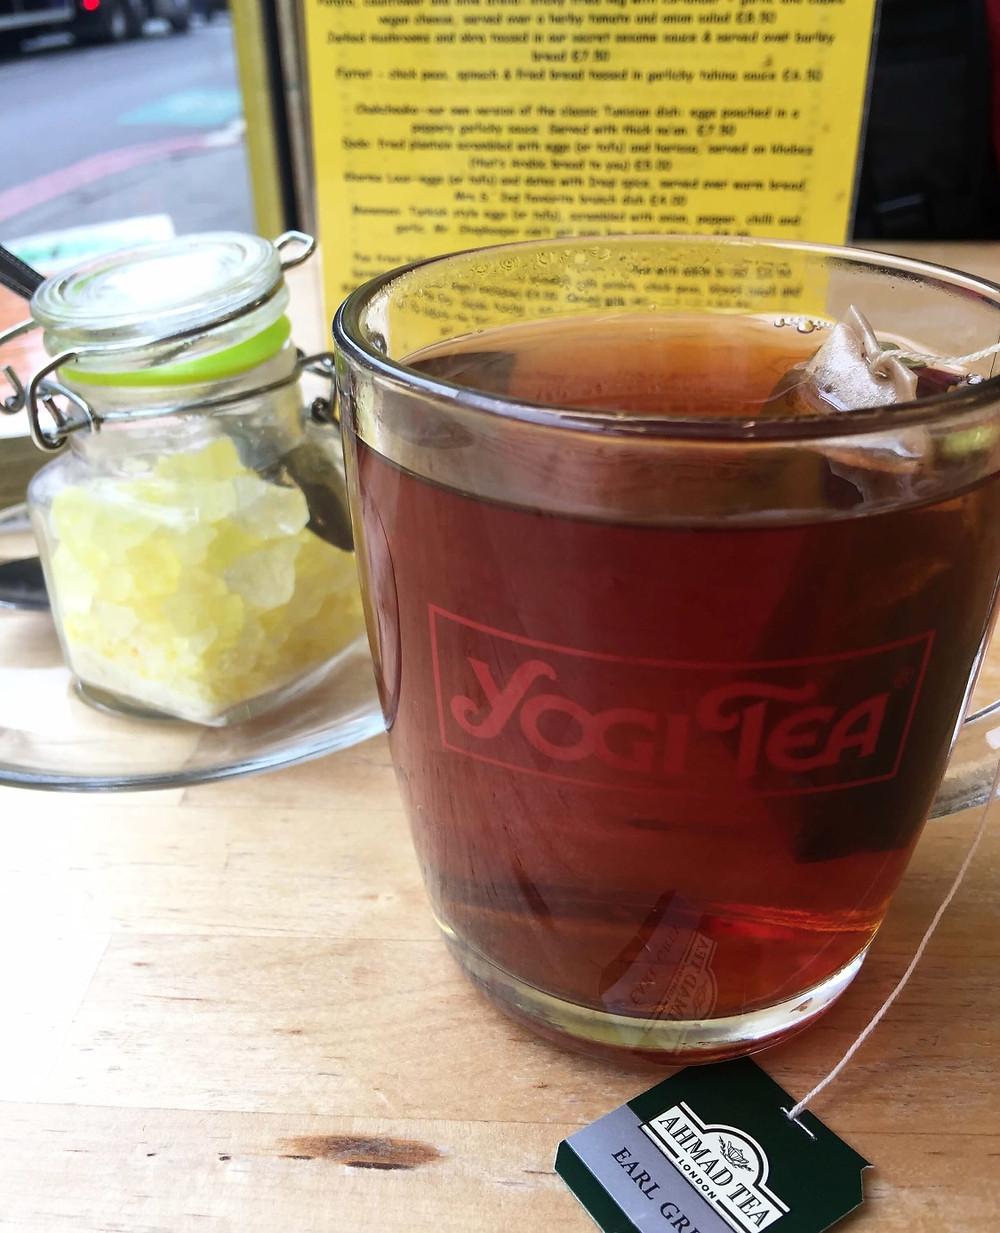 Persian tea in a YogiTea cup